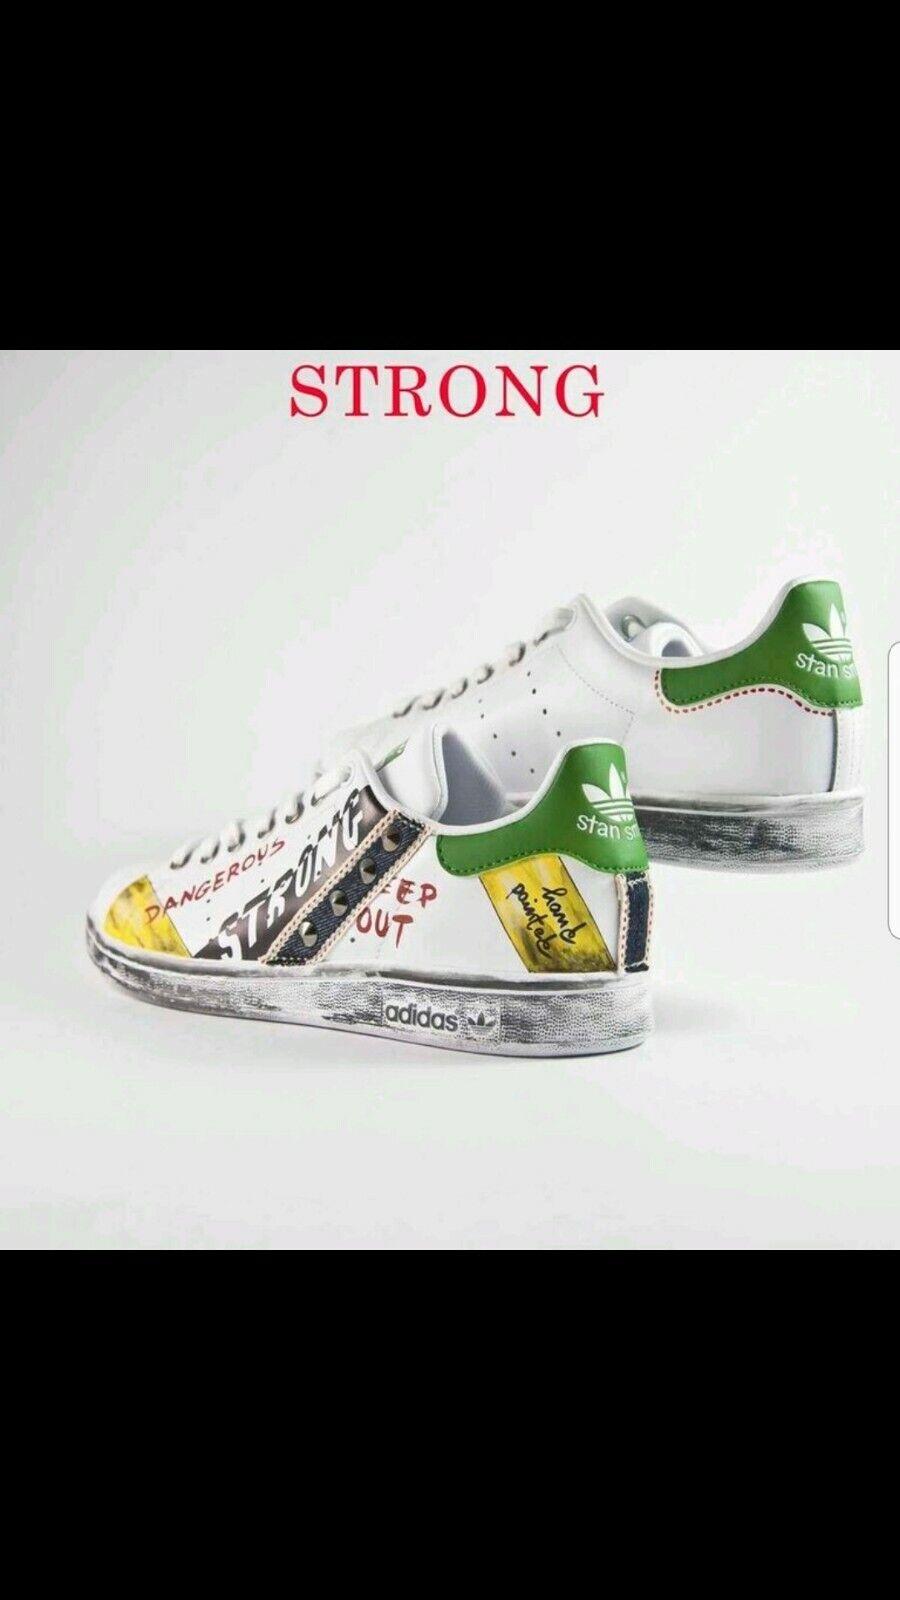 Schuhe Adidas Stan Smith Brauch Modell Strong